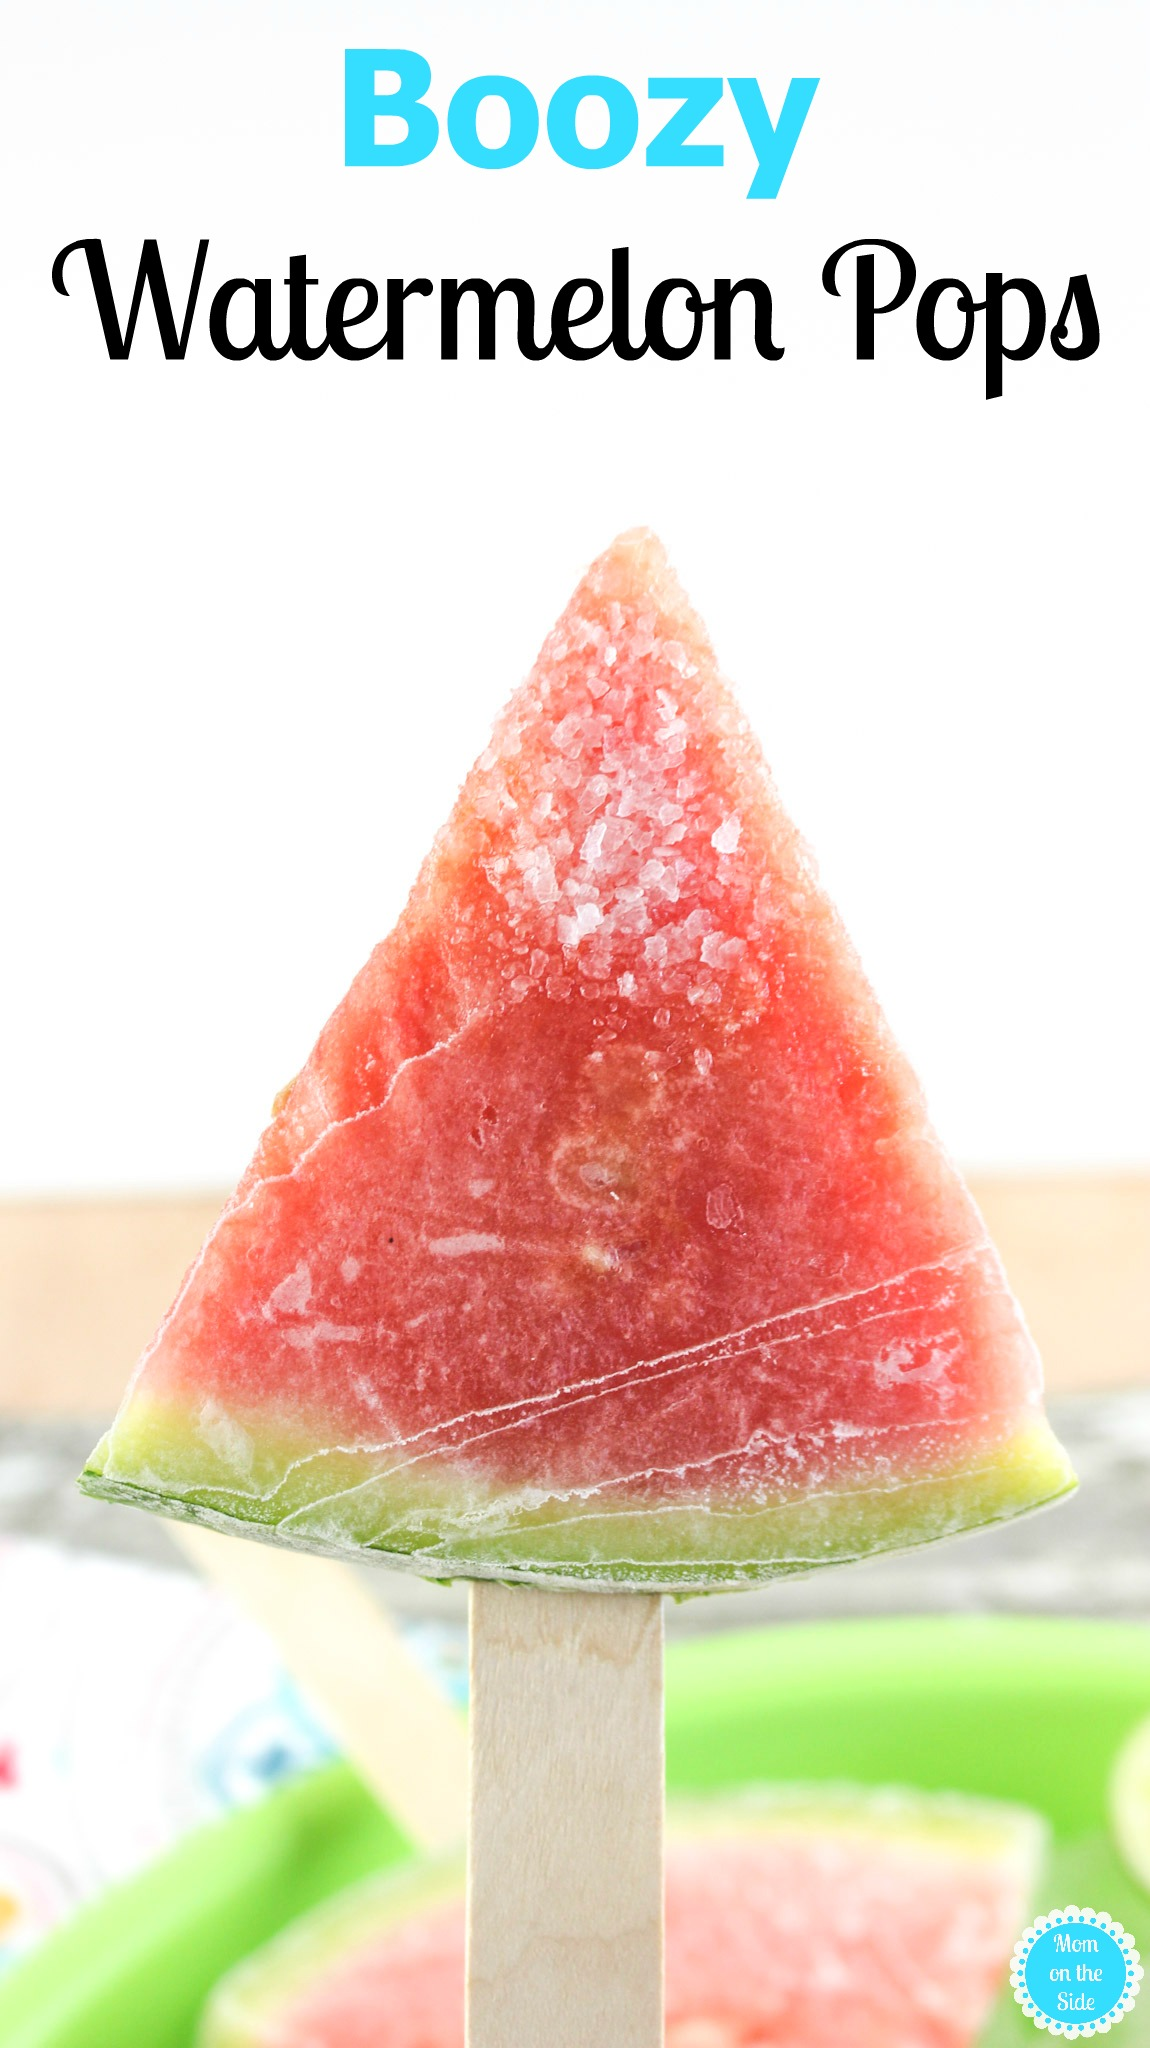 Boozy Watermelon Pops Recipe